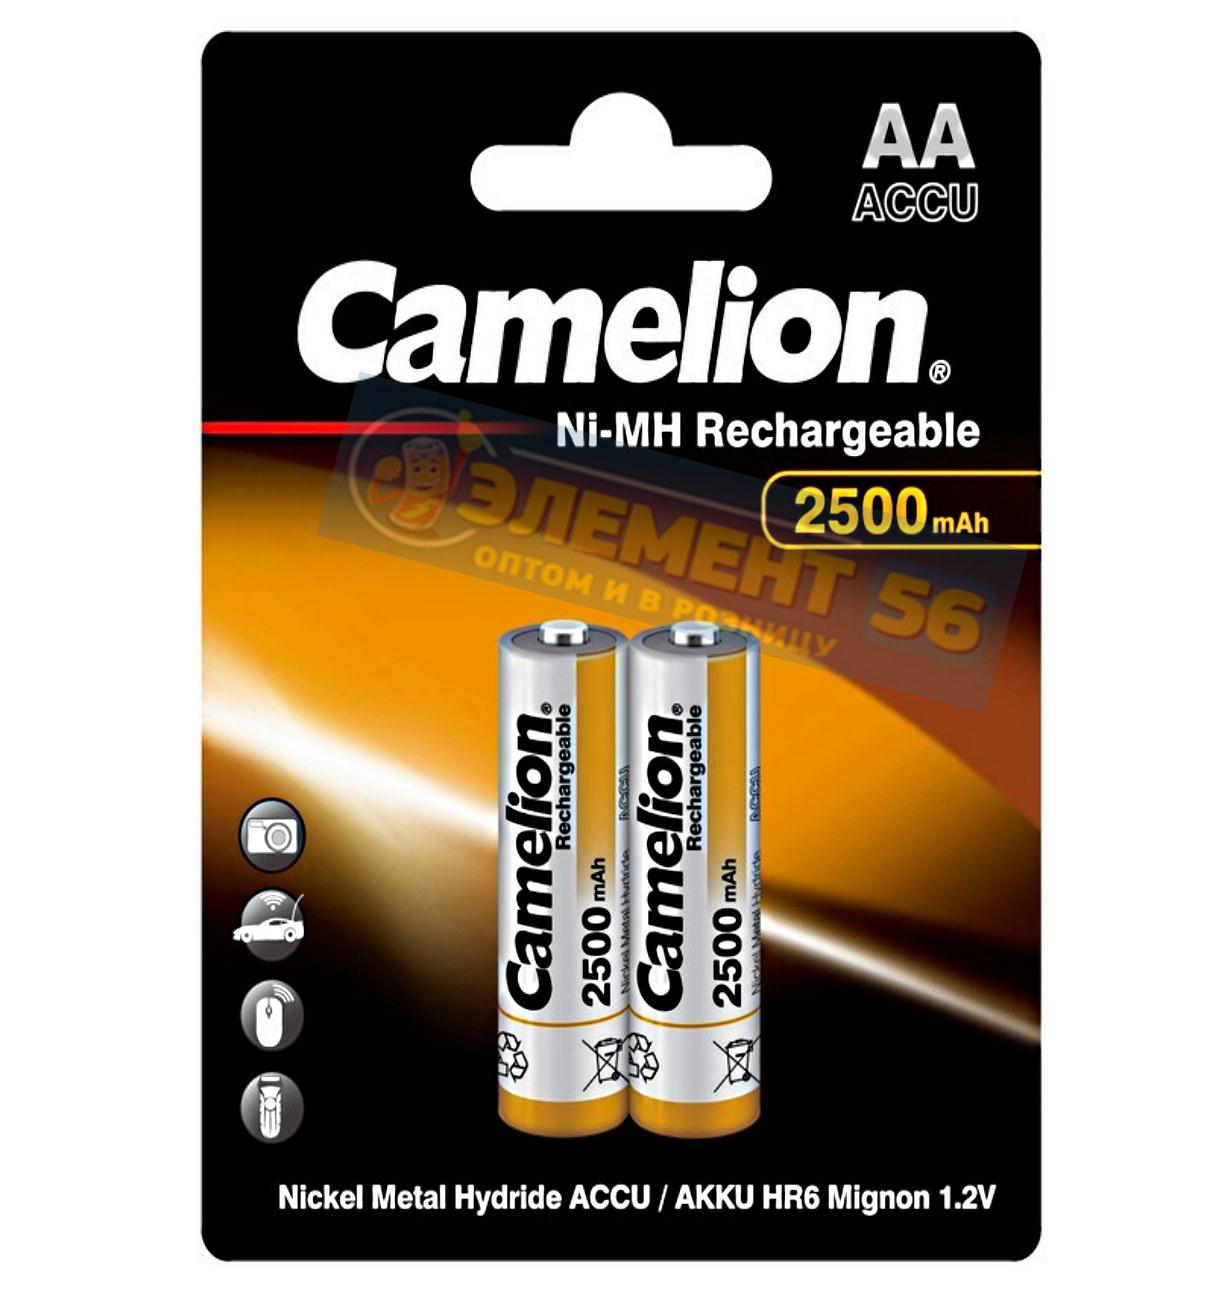 Аккумулятор CAMELION AA, HR6 (2500 mAh) MN1500, А316 2BL (2) (24) (384)